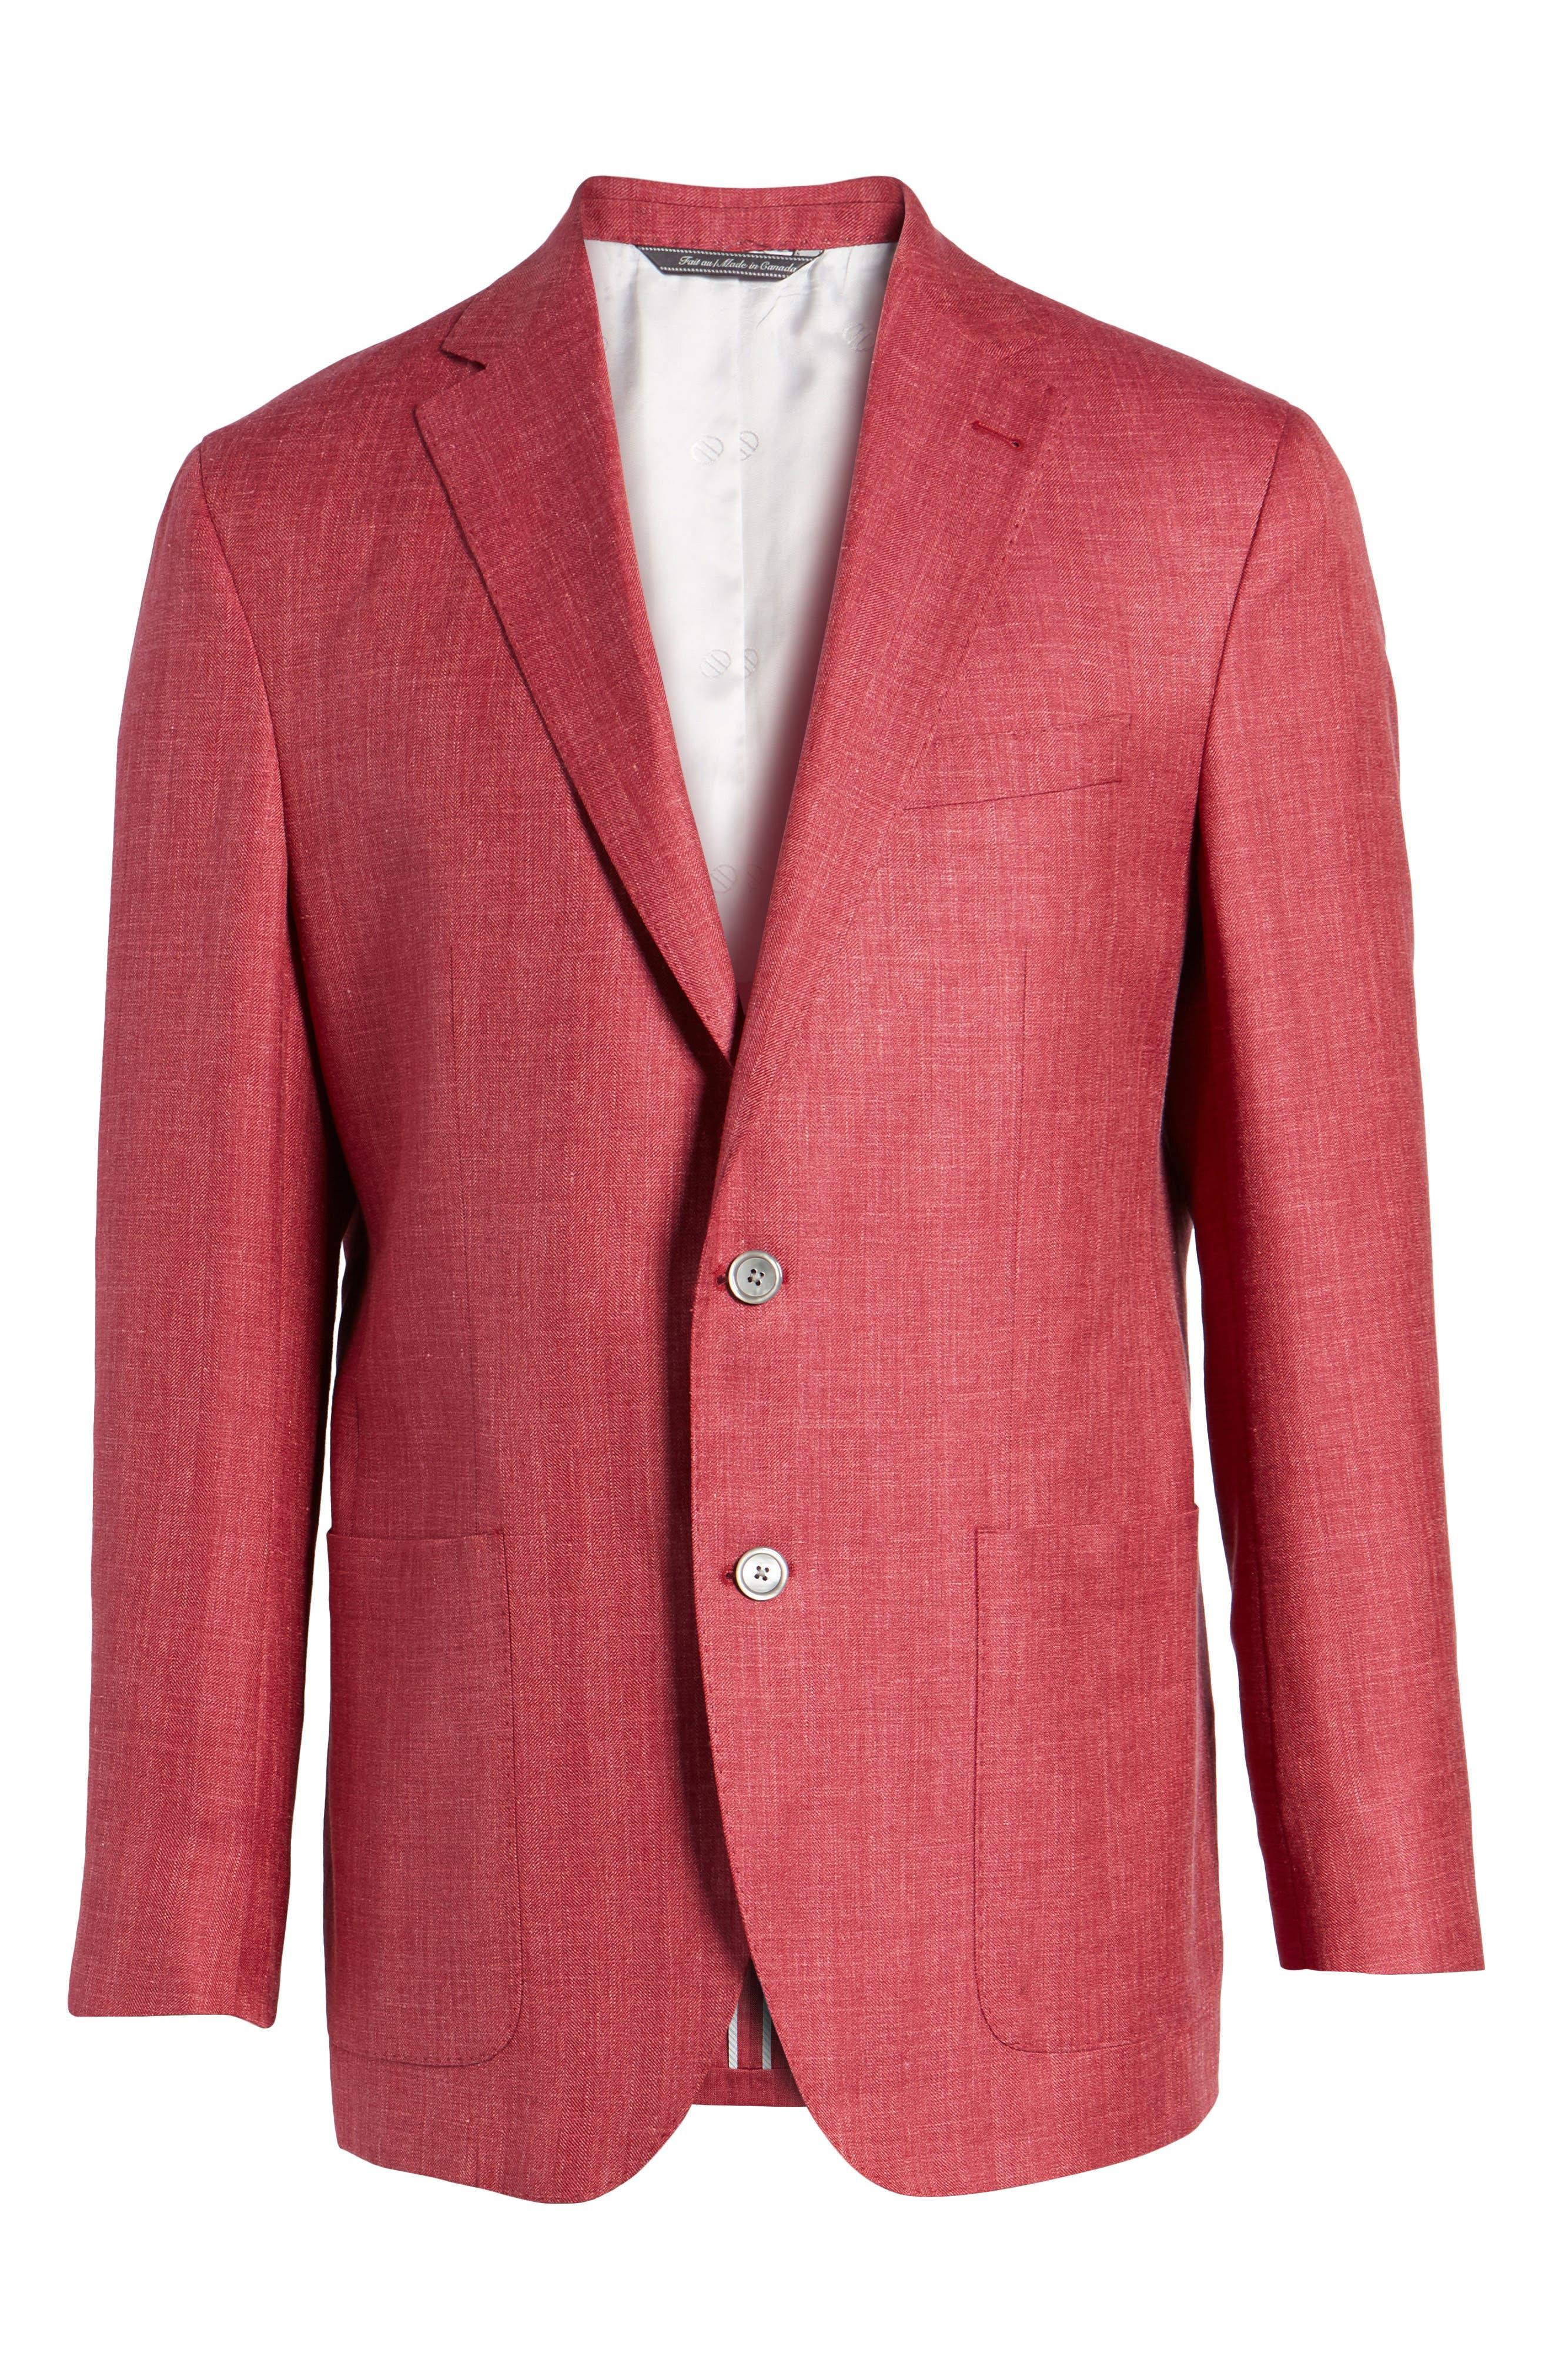 Aiden Classic Fit Wool Blend Blazer,                             Alternate thumbnail 5, color,                             600